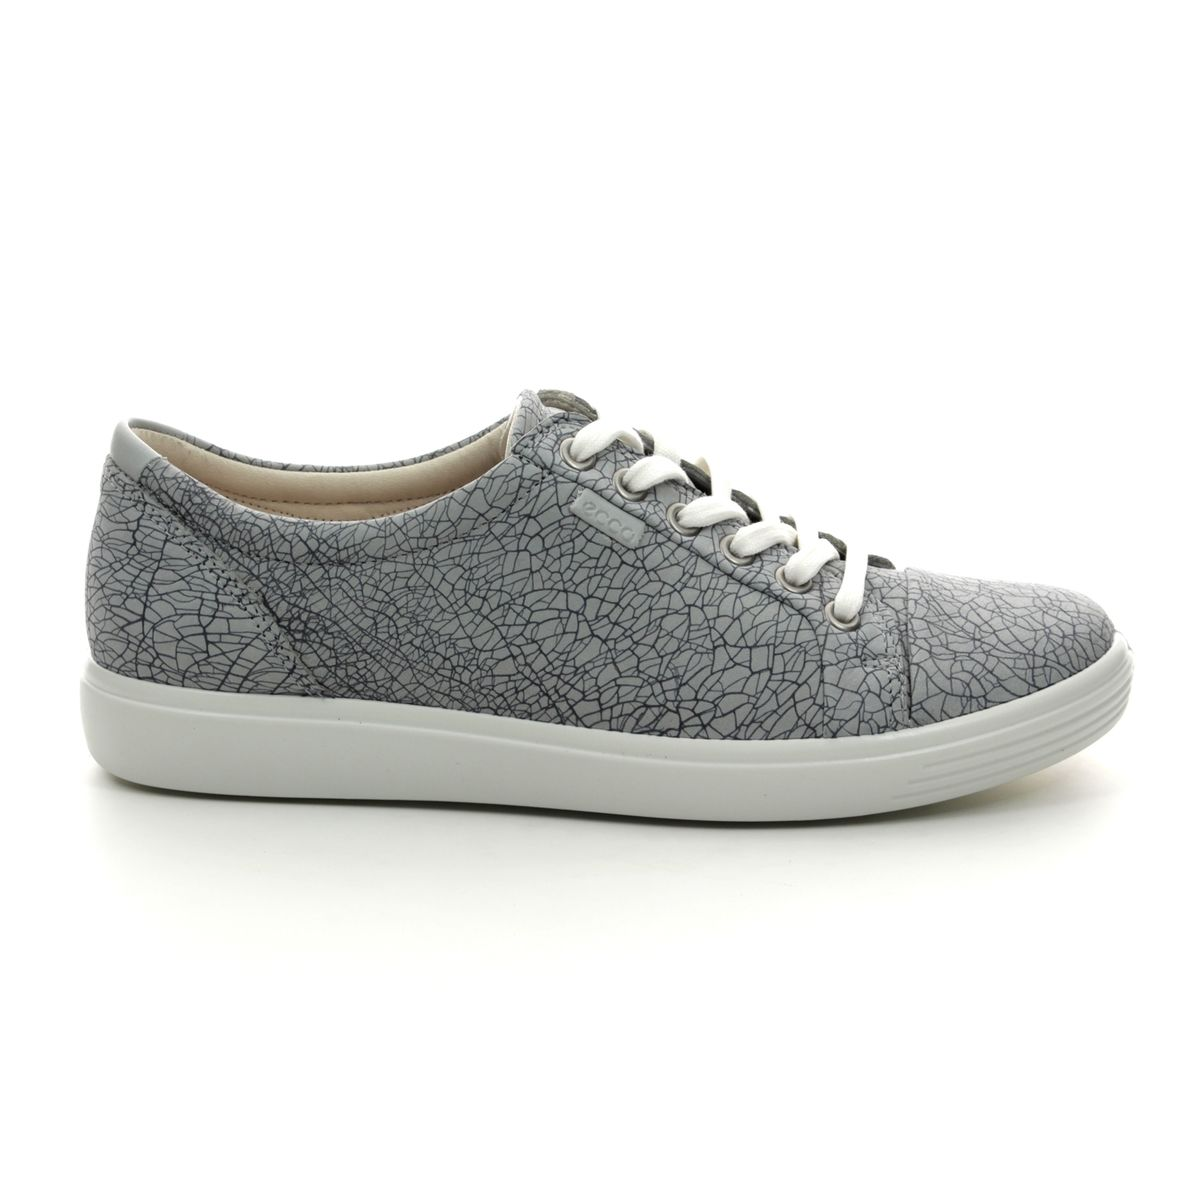 3397e7d2002fe ECCO Lacing Shoes - Grey nubuck - 430003/51411 SOFT 7 LACE